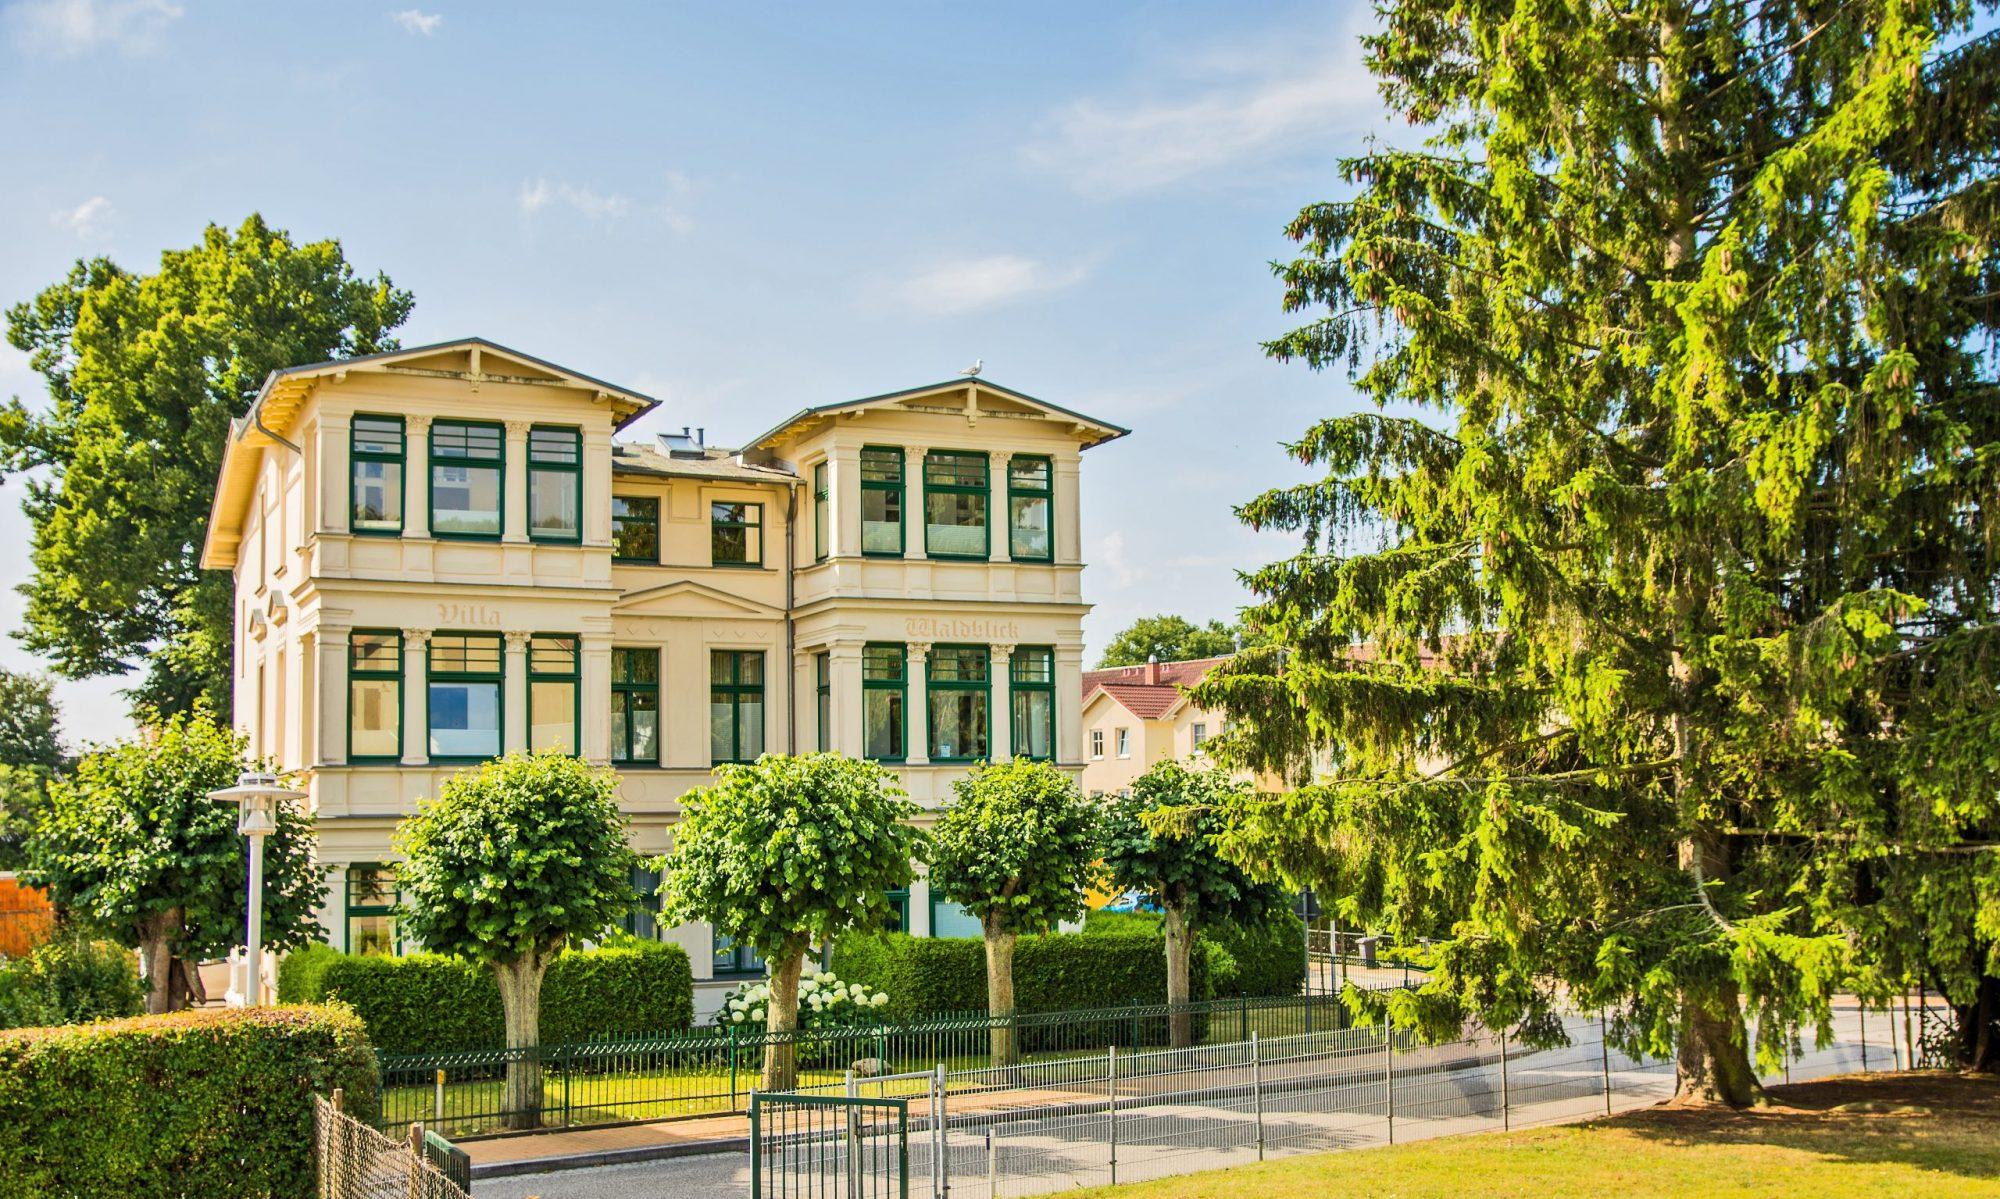 Villa-Waldblick Bansin